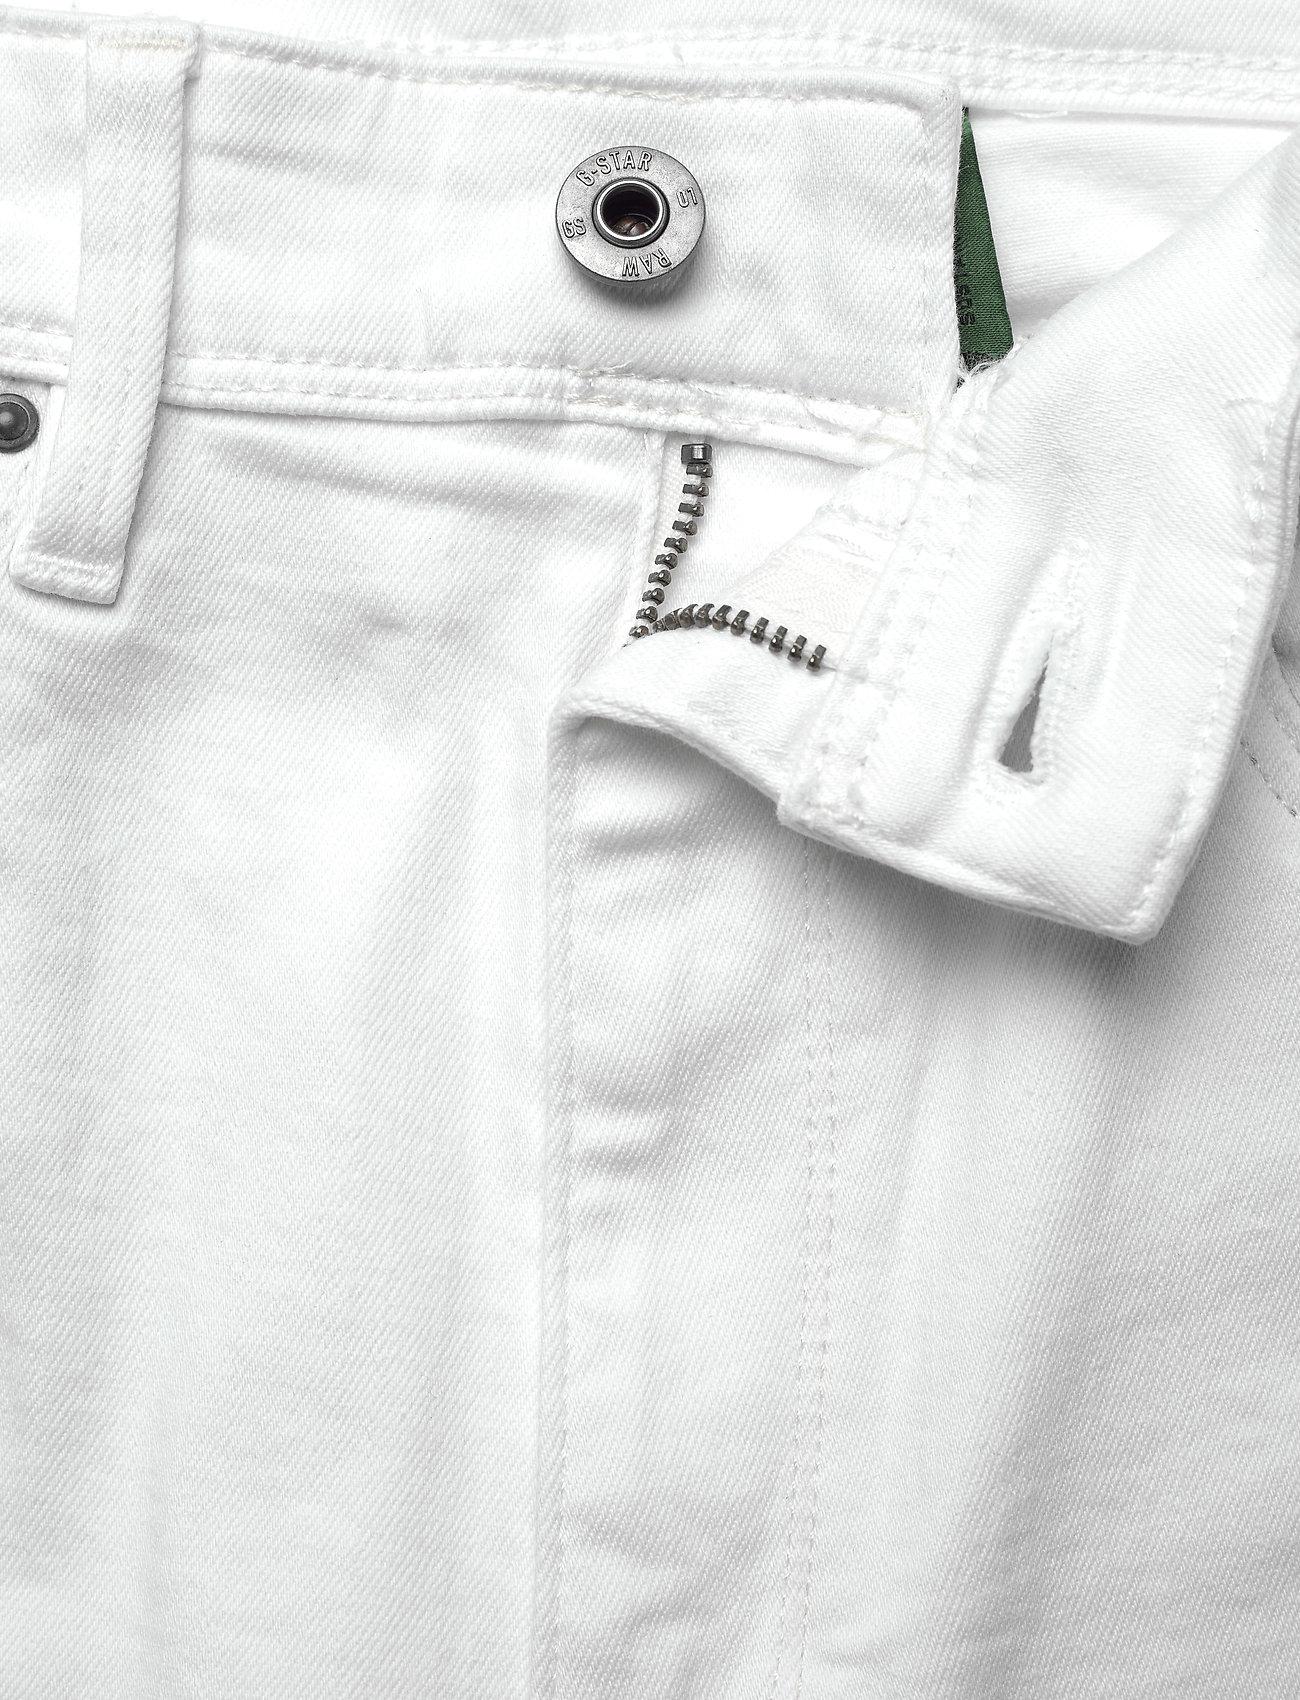 G-star RAW - Kafey Ultra High Skinny Wmn - skinny jeans - white - 2